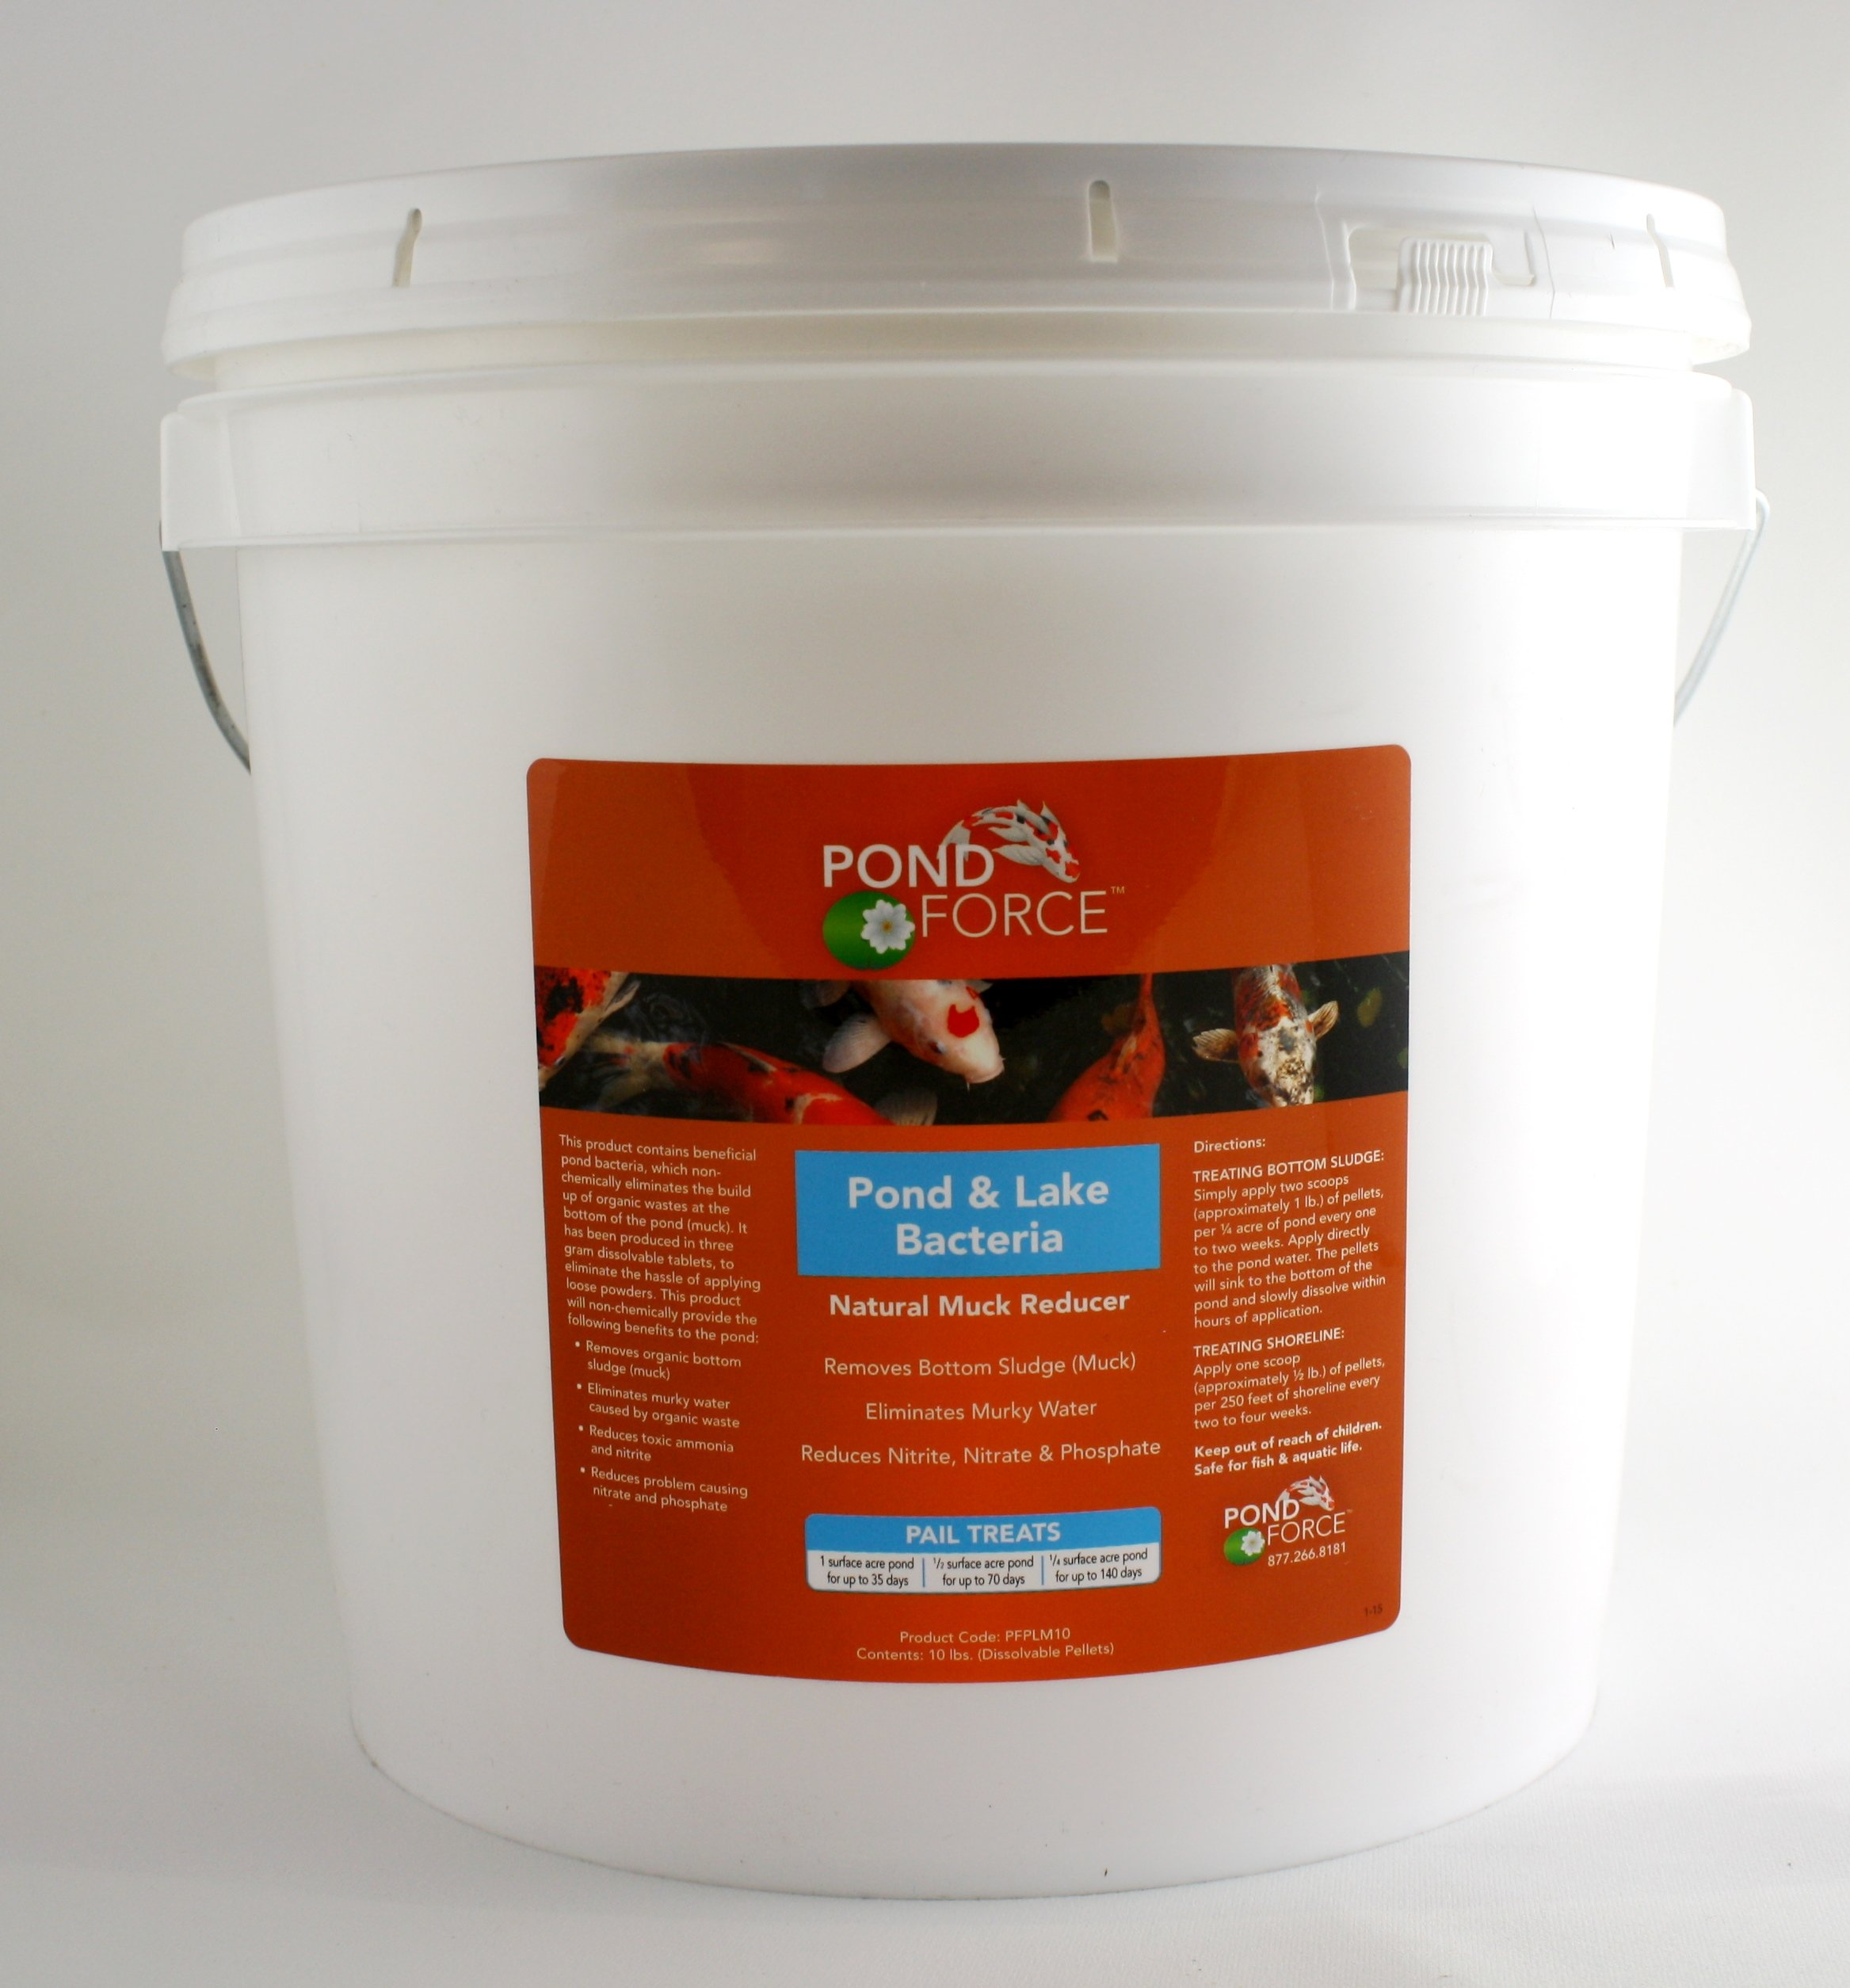 Natural Muck Reducer - 10 lbs. (Dissolvable Pellets)